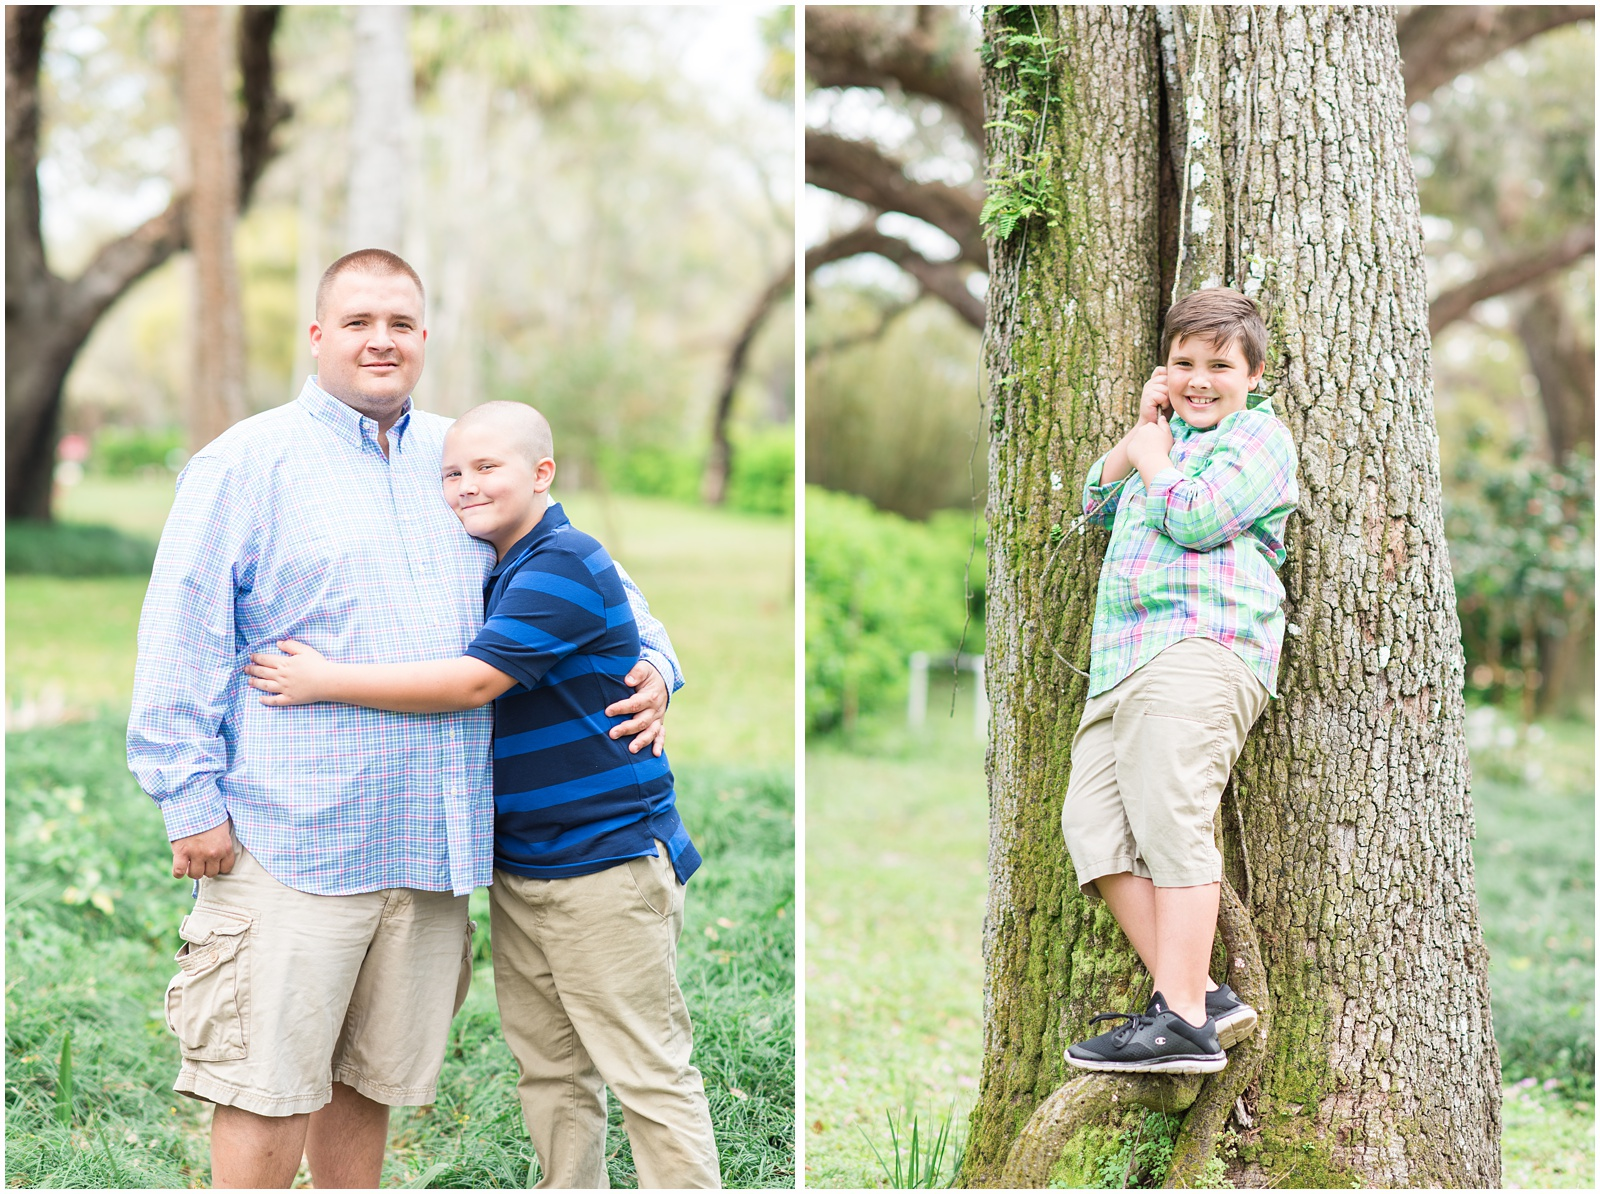 Washington Oaks_Garden_State Park_Family_Portraits_5.jpg